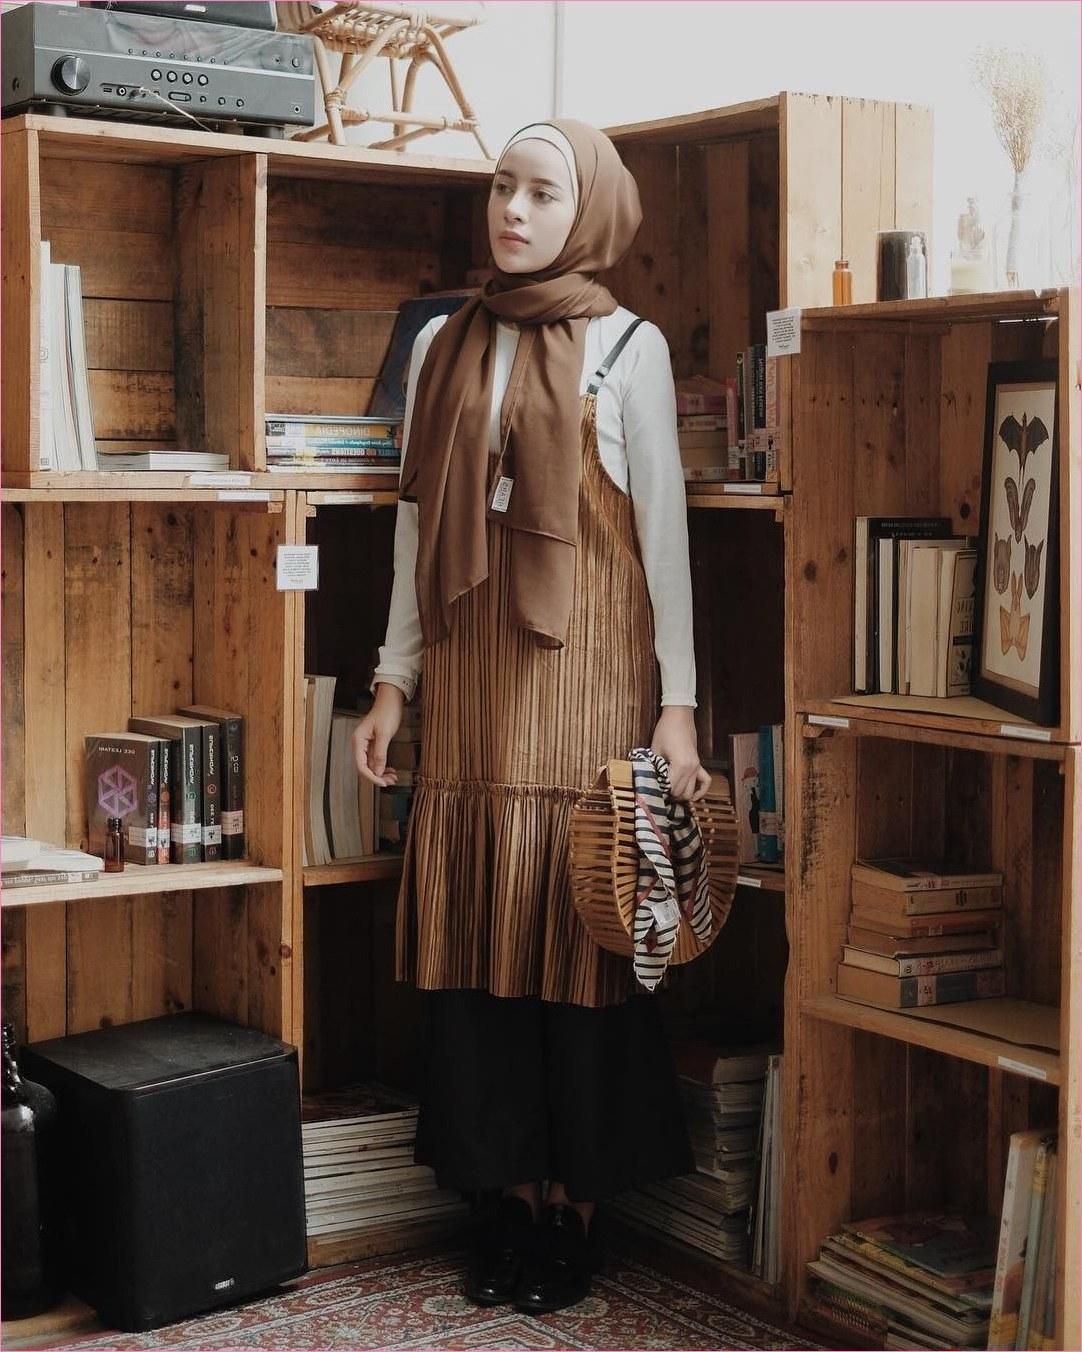 Inspirasi Baju Lebaran Casual 2019 Jxdu 80 Model Baju Lebaran Terbaru 2019 Muslimah Trendy Model